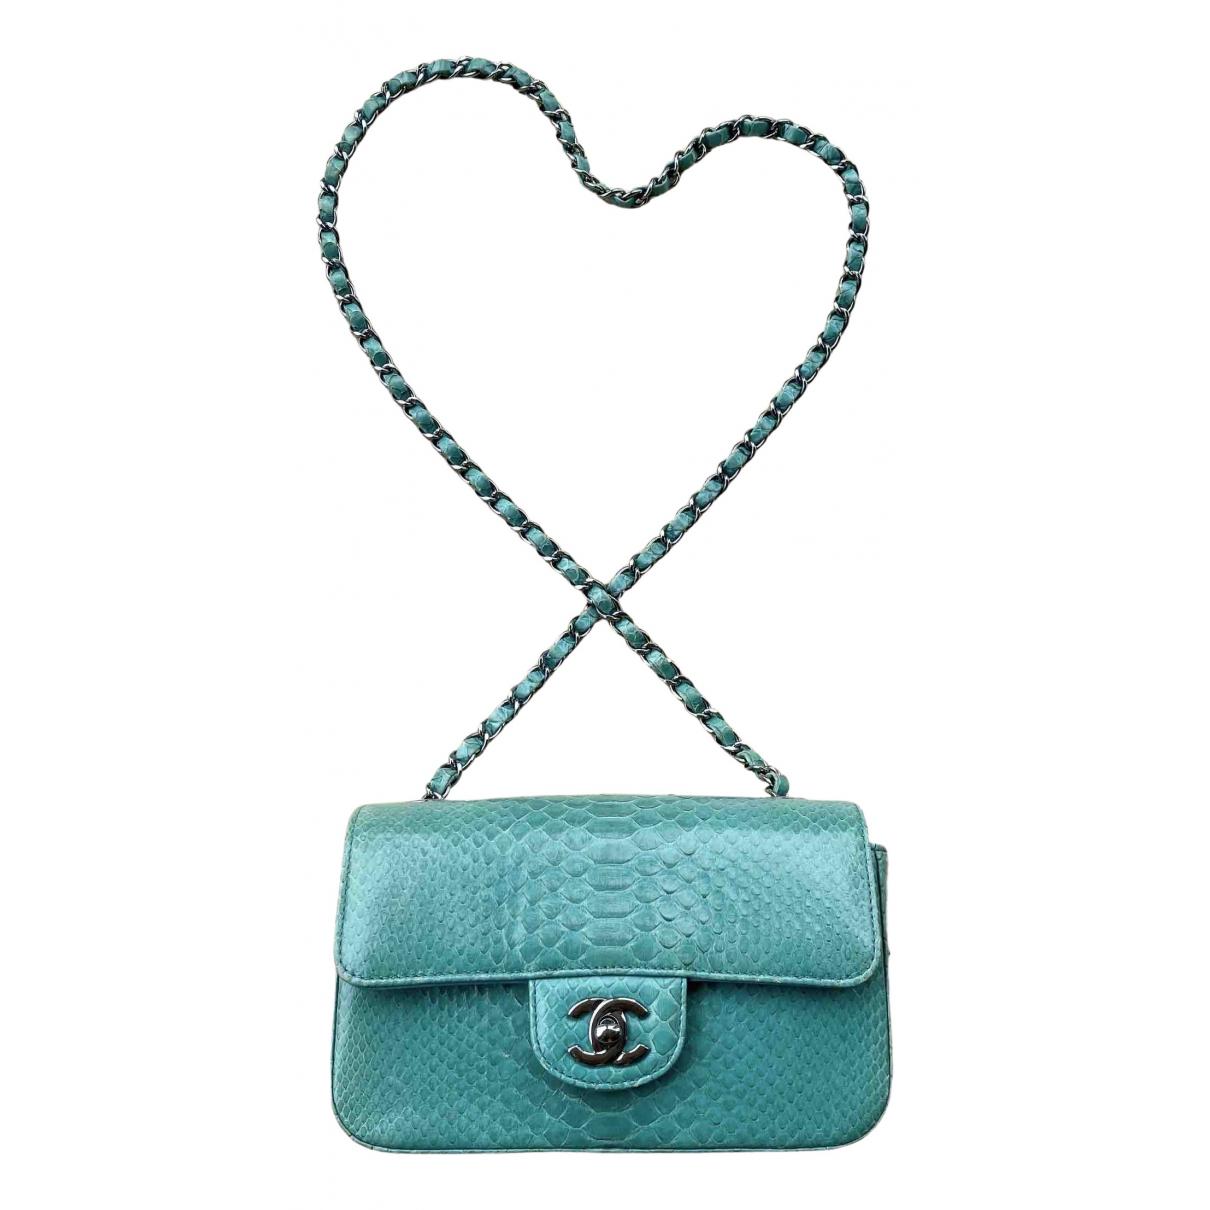 Chanel Timeless/Classique Turquoise Python handbag for Women \N